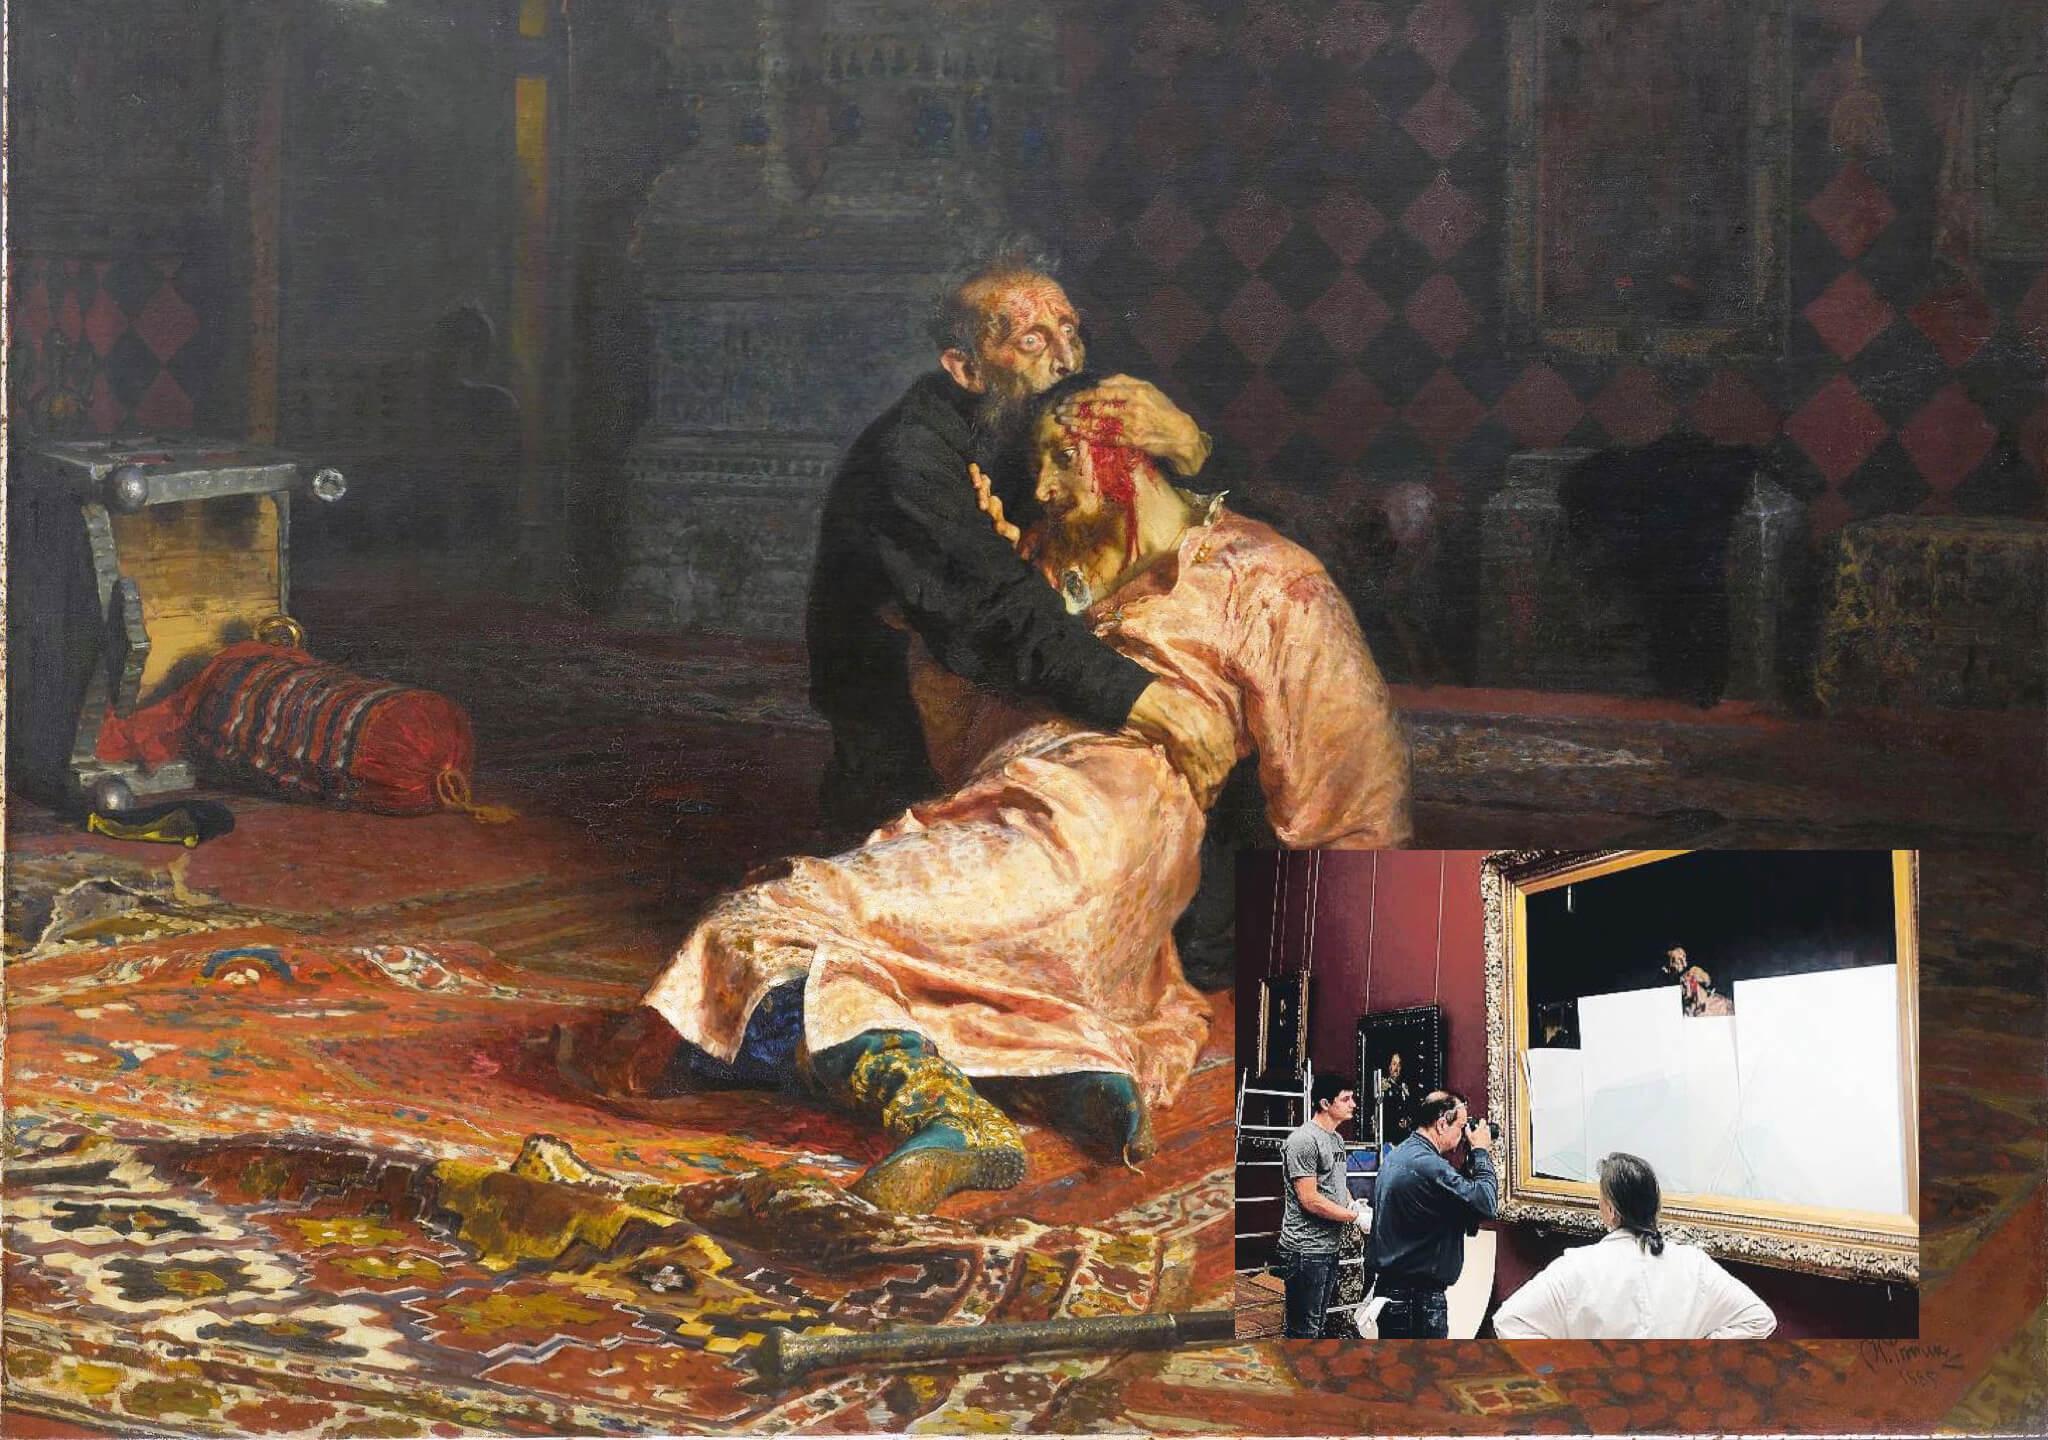 La leyenda sobre Iván el Terrible